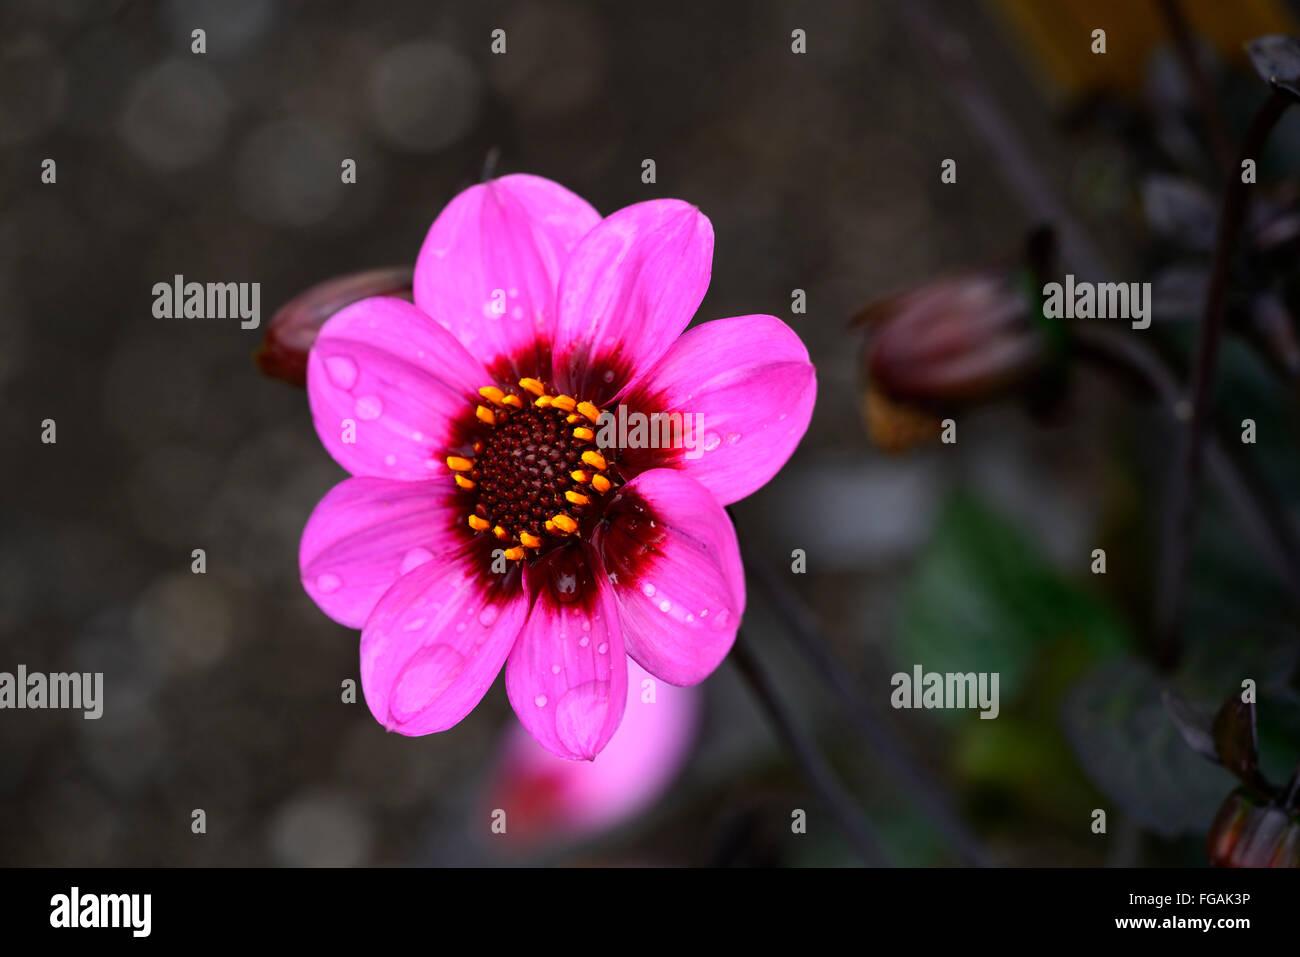 Dahlia happy single wink pink purple dahlias flower flowers bloom dahlia happy single wink pink purple dahlias flower flowers bloom blossom perennial tuber tuberous plant rm floral izmirmasajfo